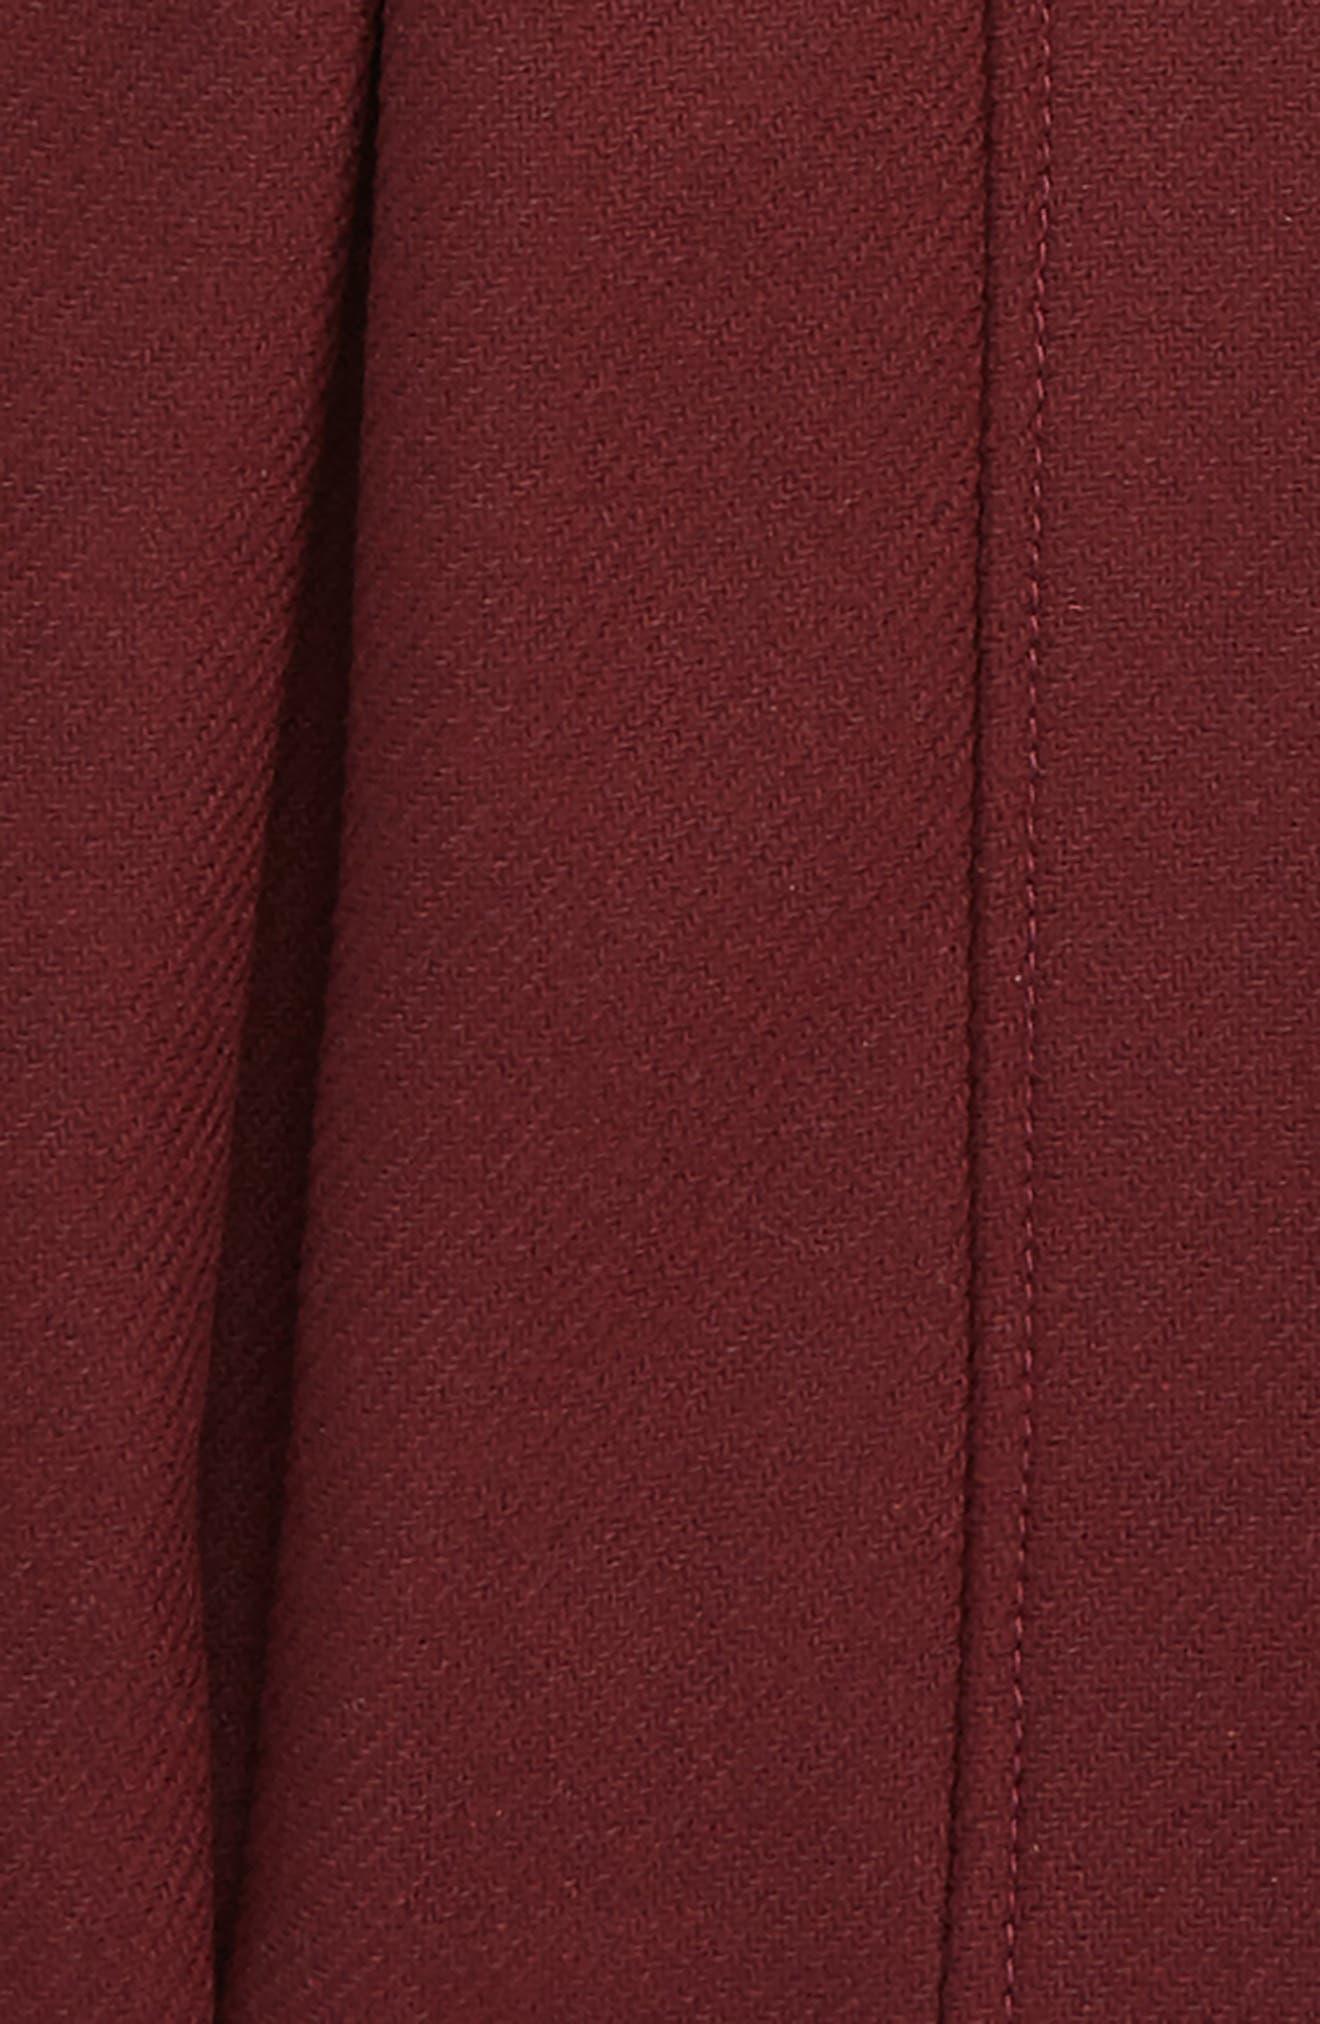 Mini Frieda Wool Peacoat,                             Alternate thumbnail 2, color,                             930